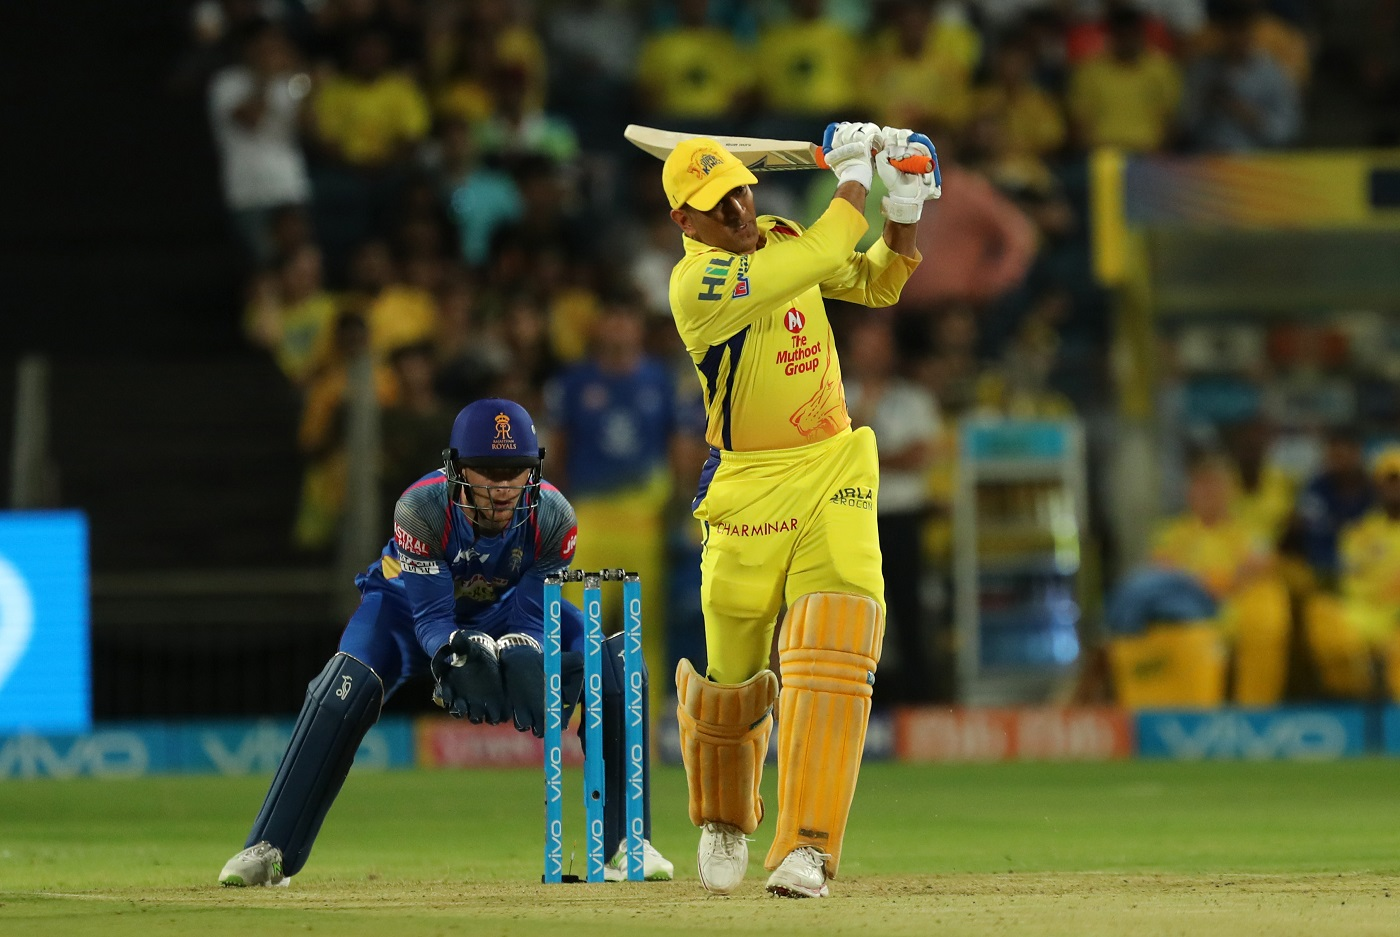 CSK vs RR  IPL 2018 MATCH No 17